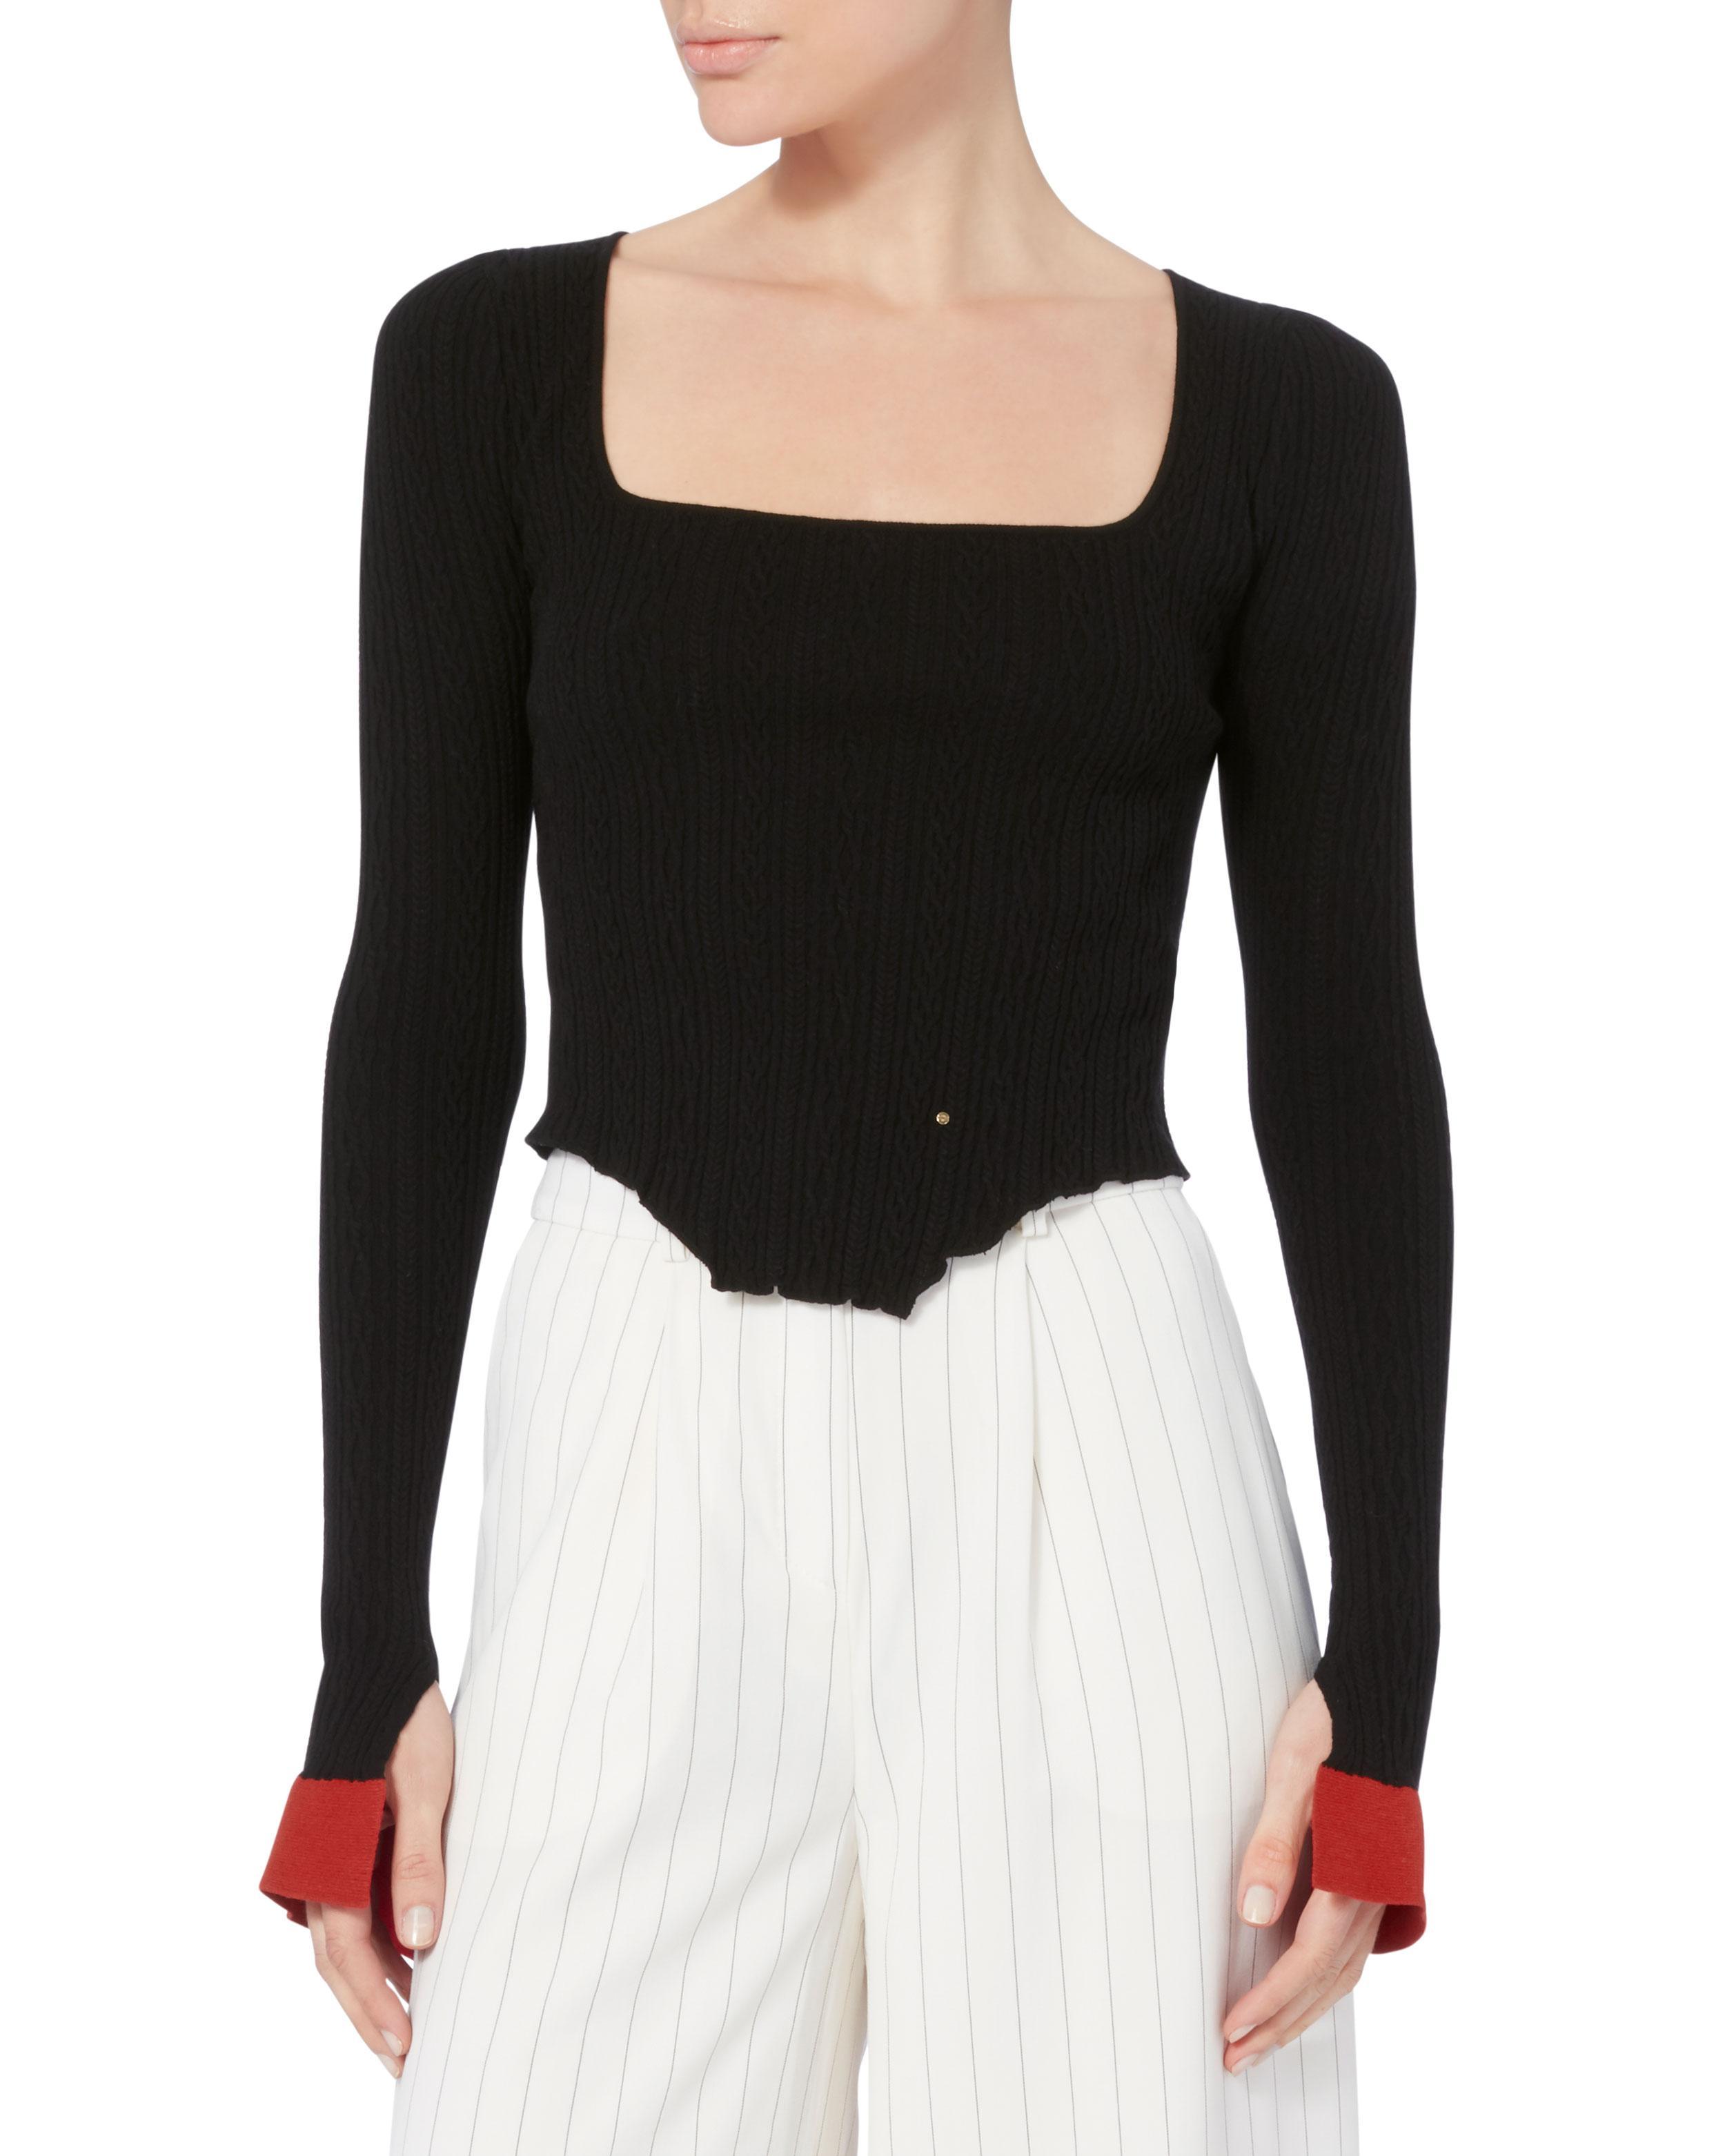 38073e8746 Lyst - Esteban Cortazar Kira Corset Hem Knit Top in Black